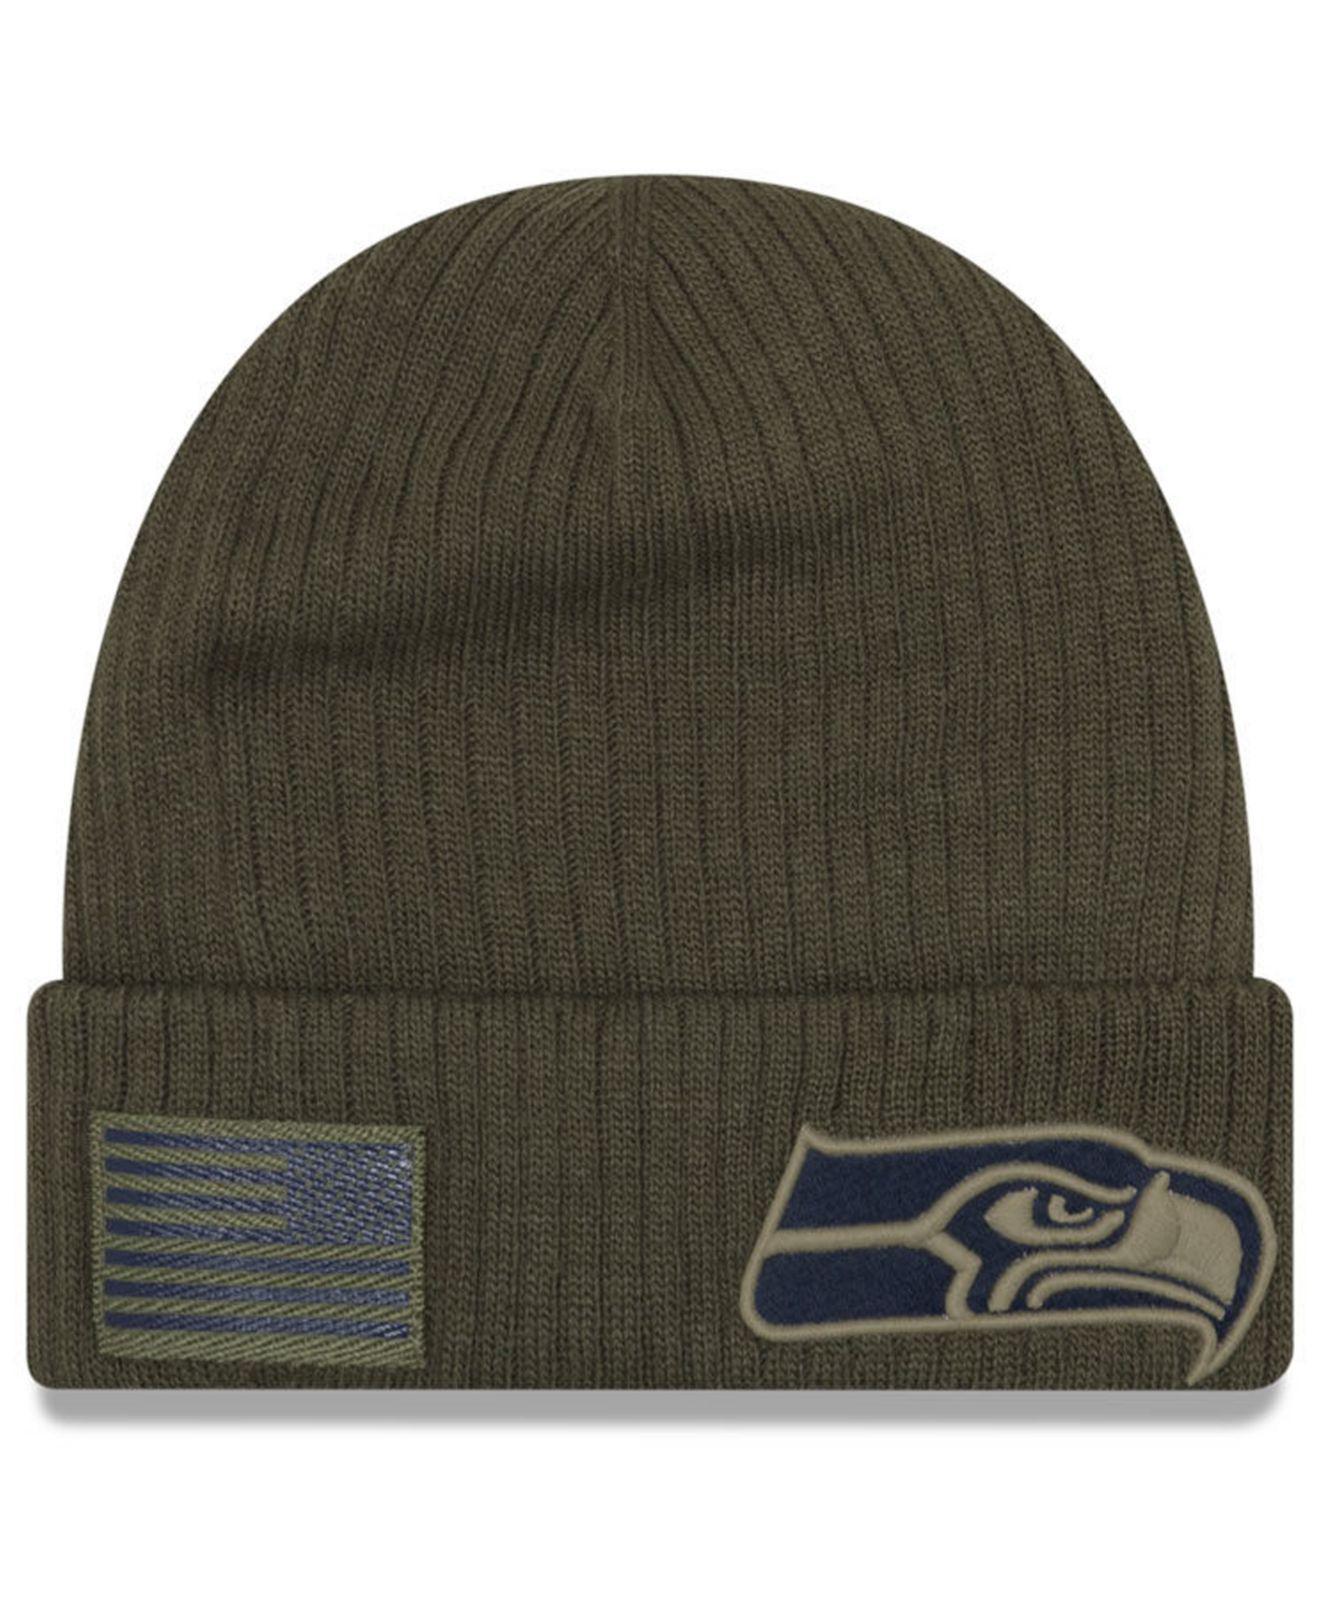 Lyst - Ktz Seattle Seahawks Salute To Service Cuff Knit Hat in Green for Men 795034c5d